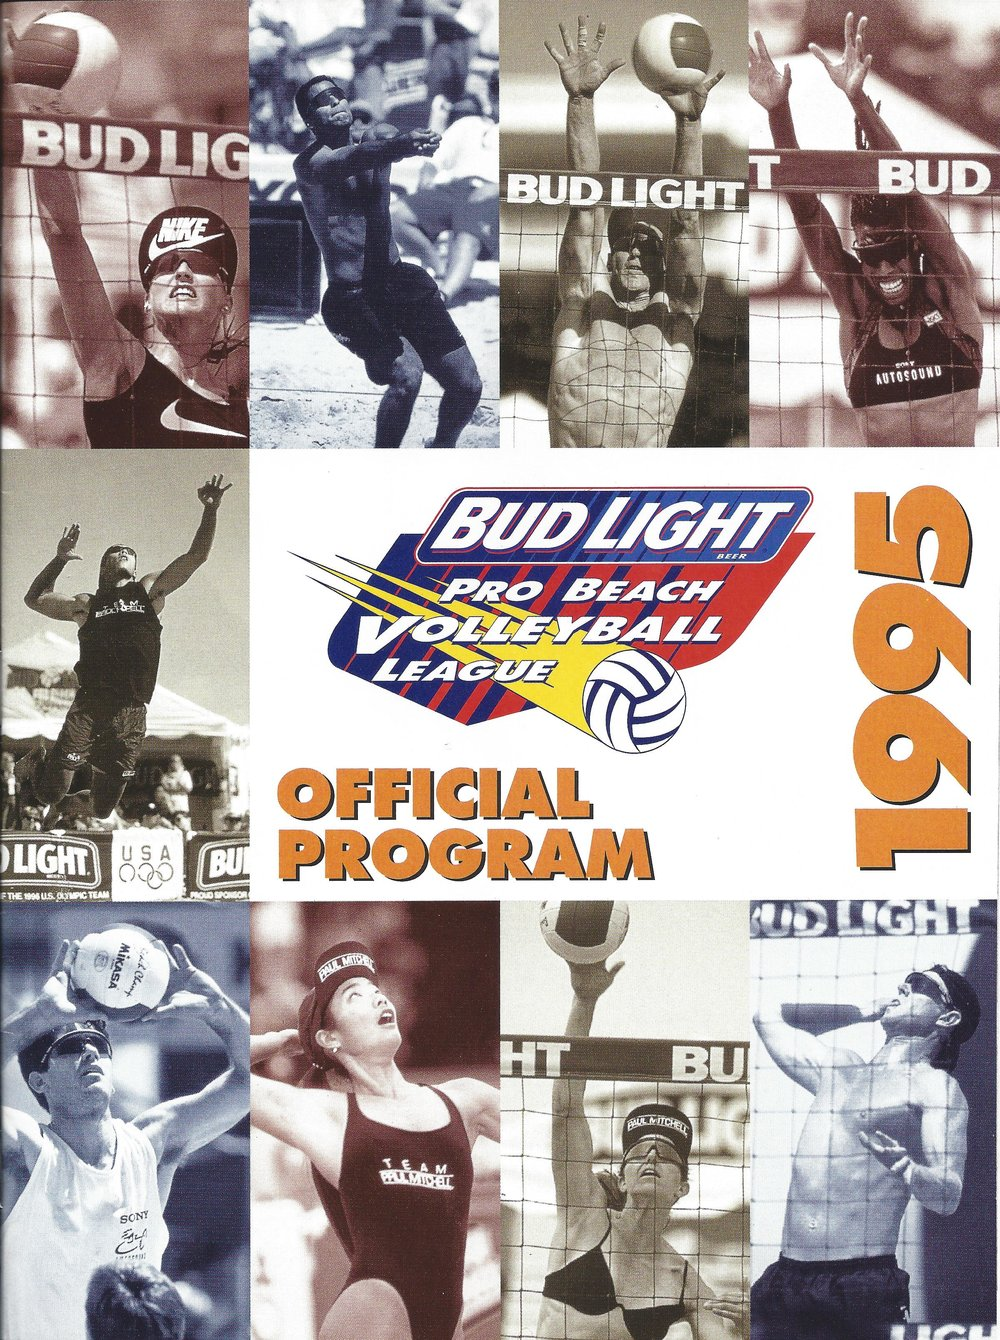 VB-Tour-Guide-1995.jpg